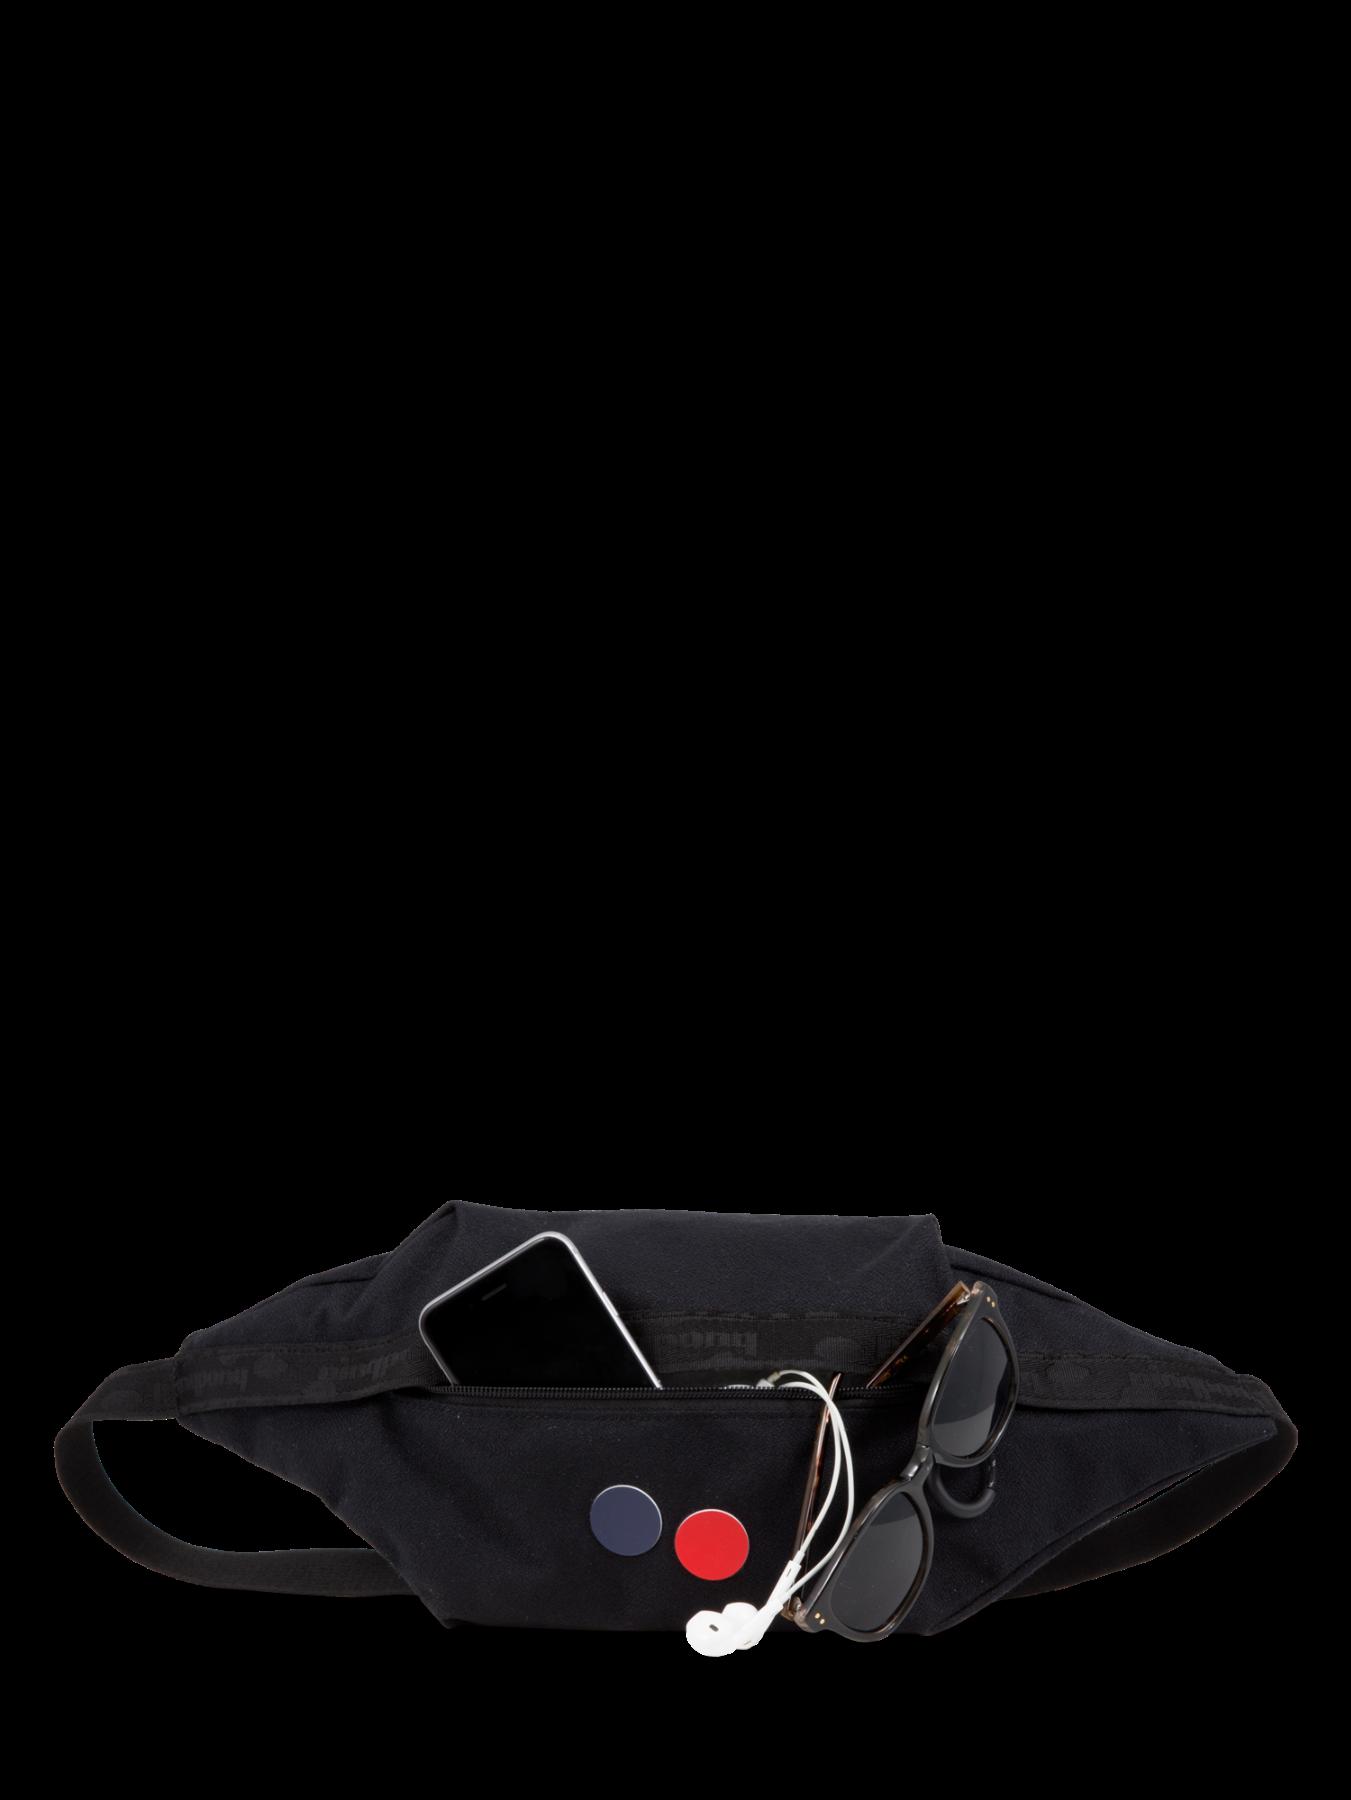 pinqponq Hipbag BRIK - Licorice Black